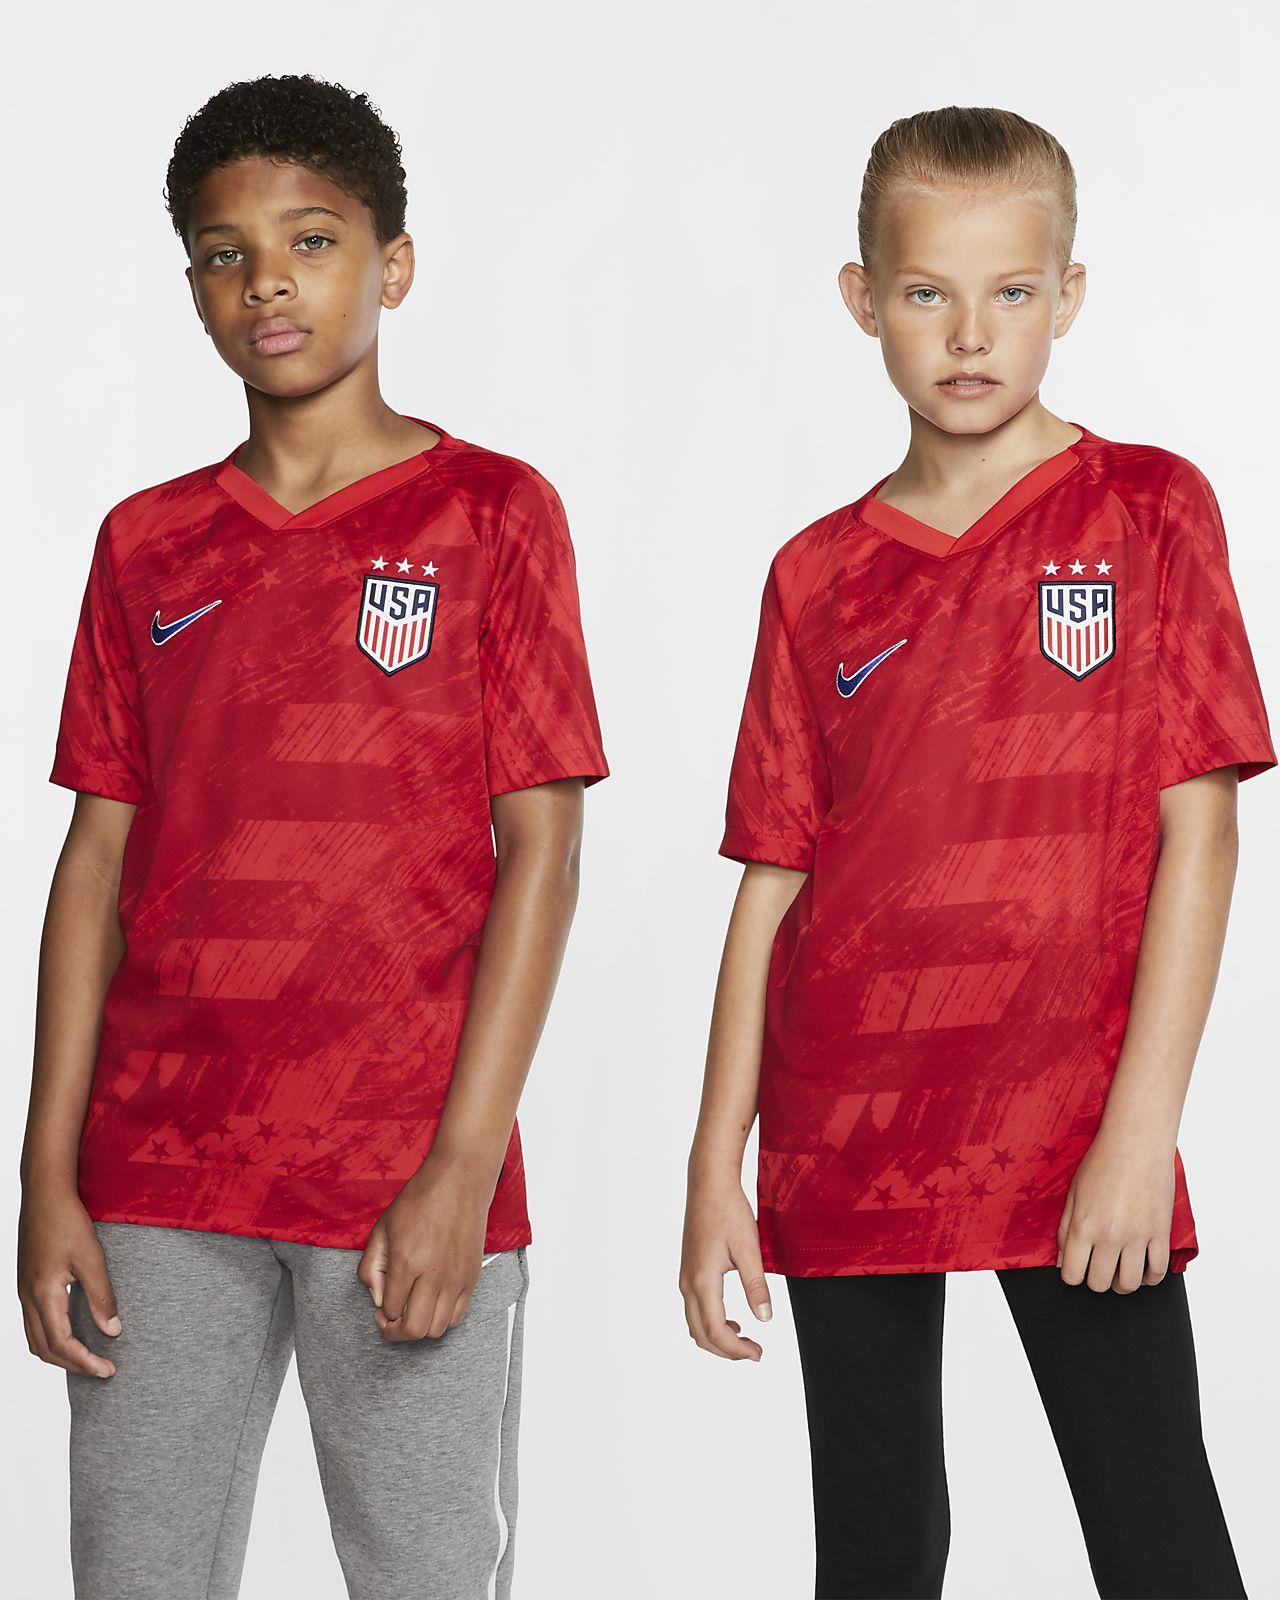 U.S. Stadium 2019 (3-Star) Big Kids' Away Jersey